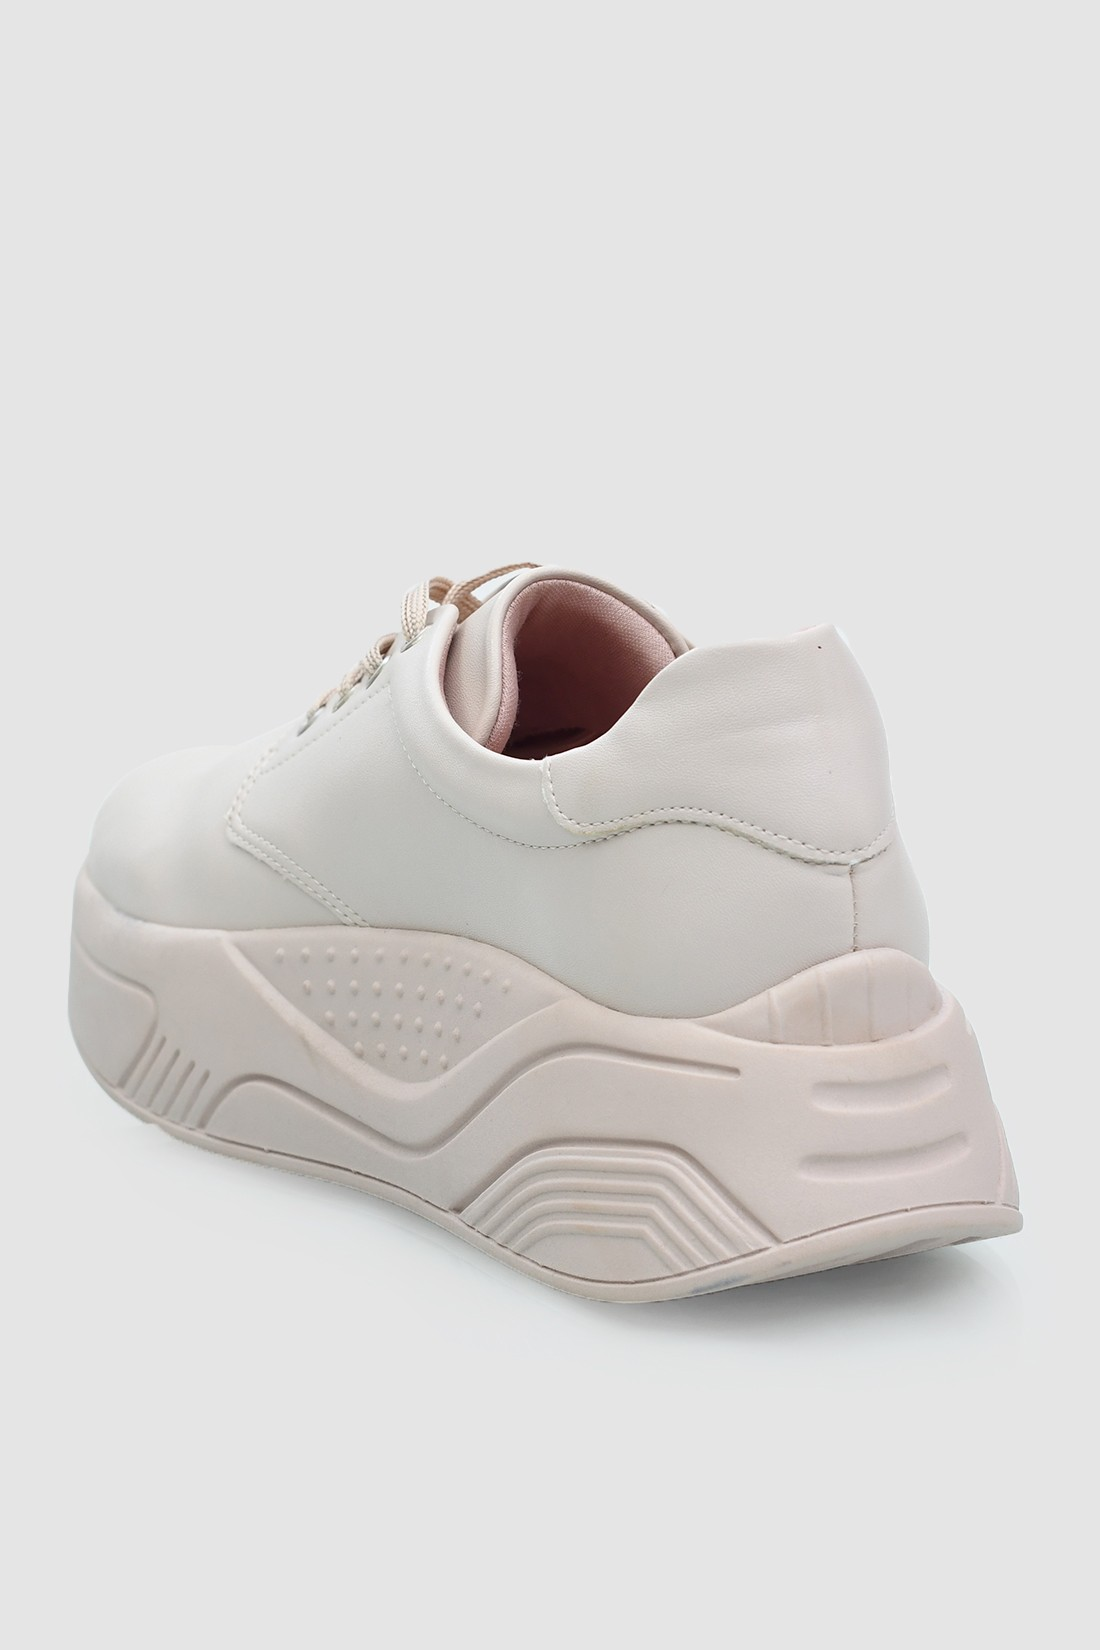 Tenis Ugly Sneaker Quiz Perola